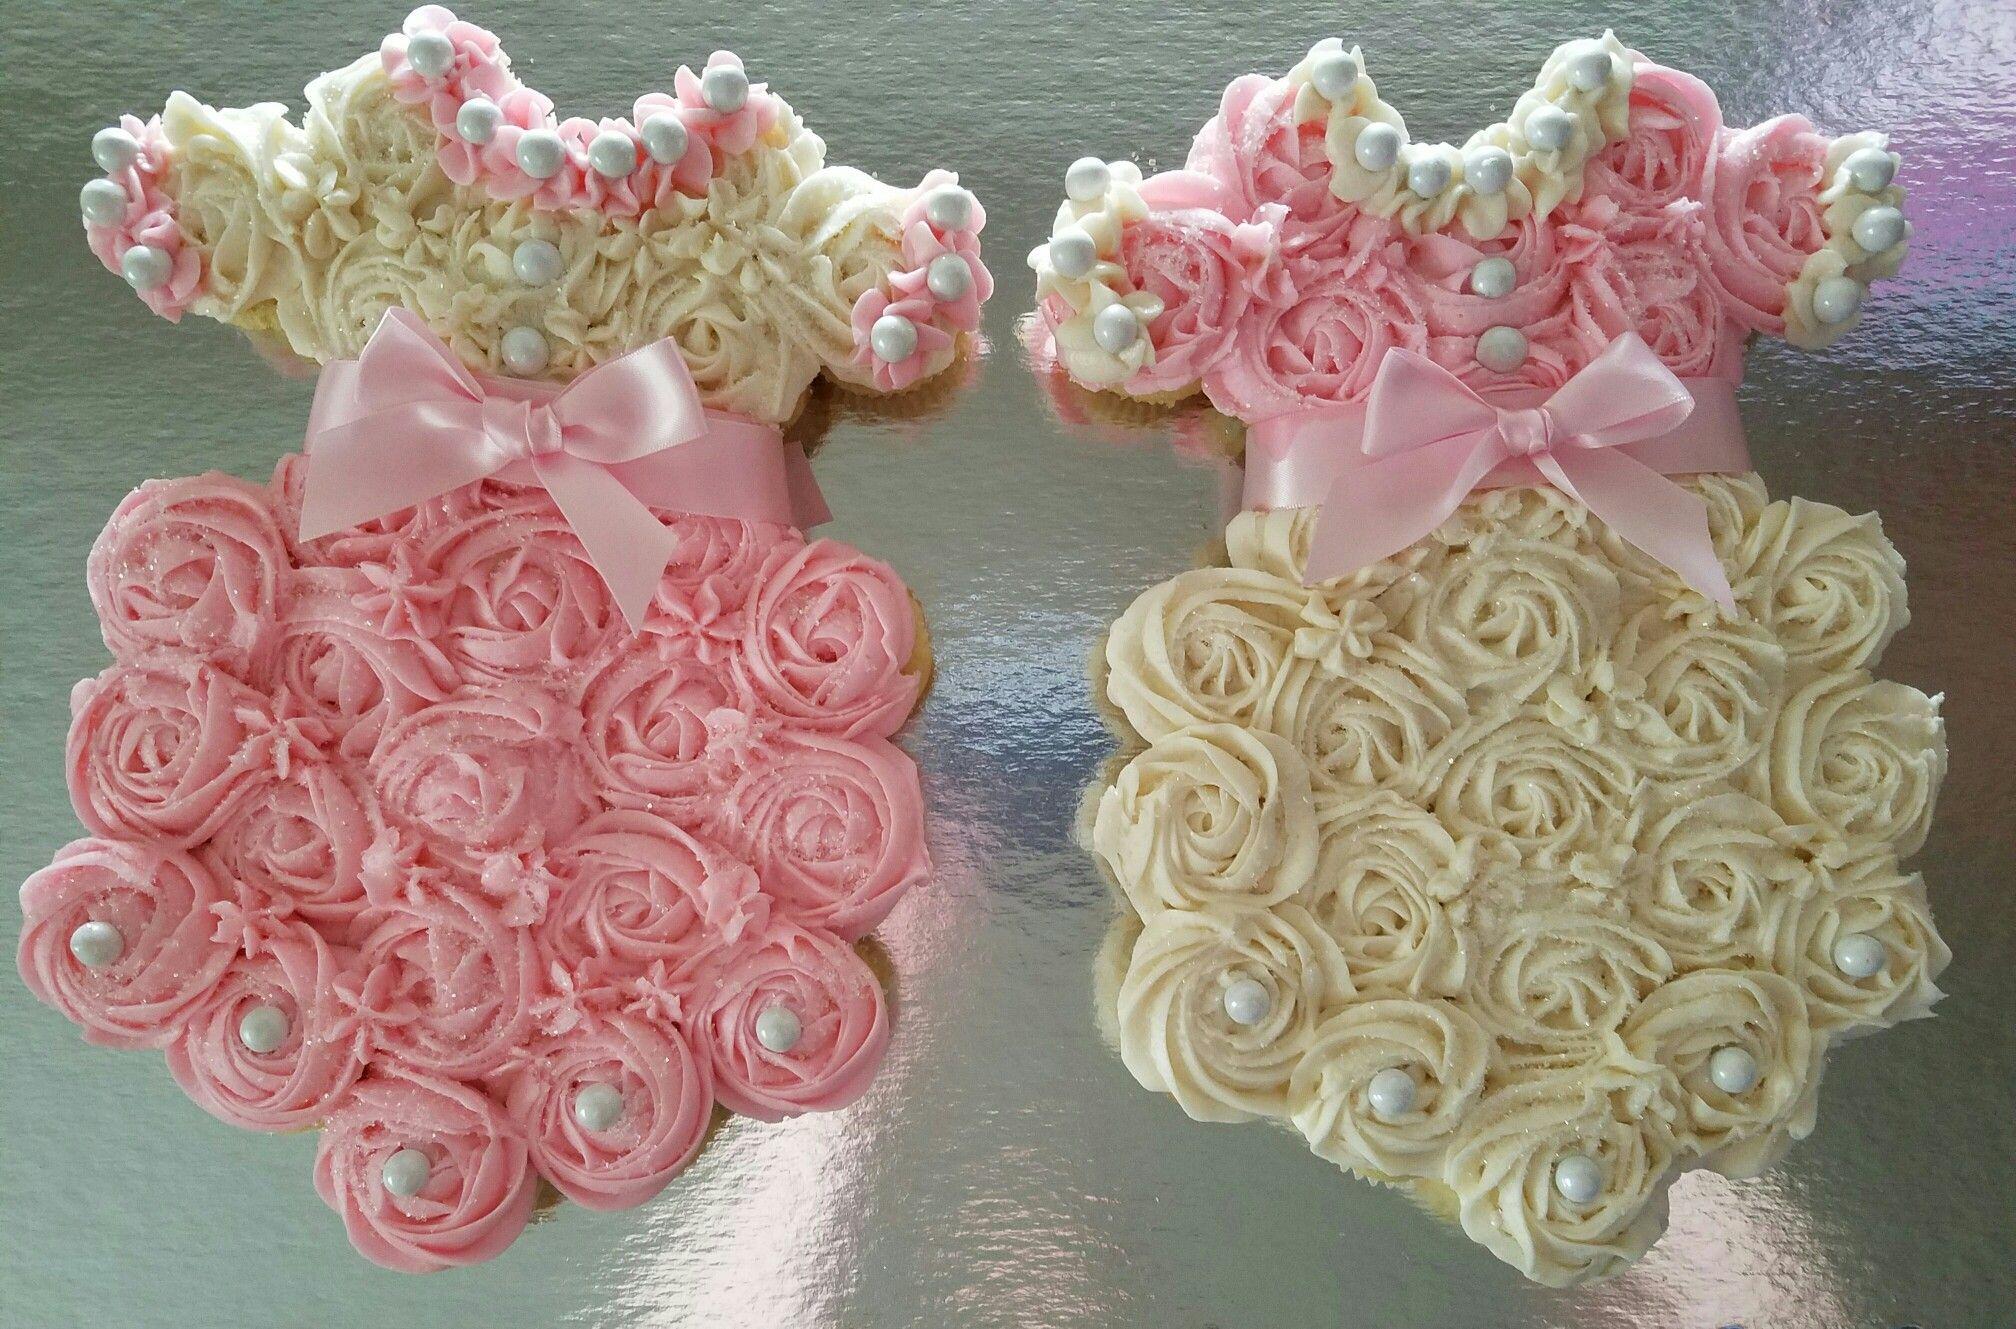 Twins Baby Girl Dress Pull Apart Cupcake Cake Baby Shower